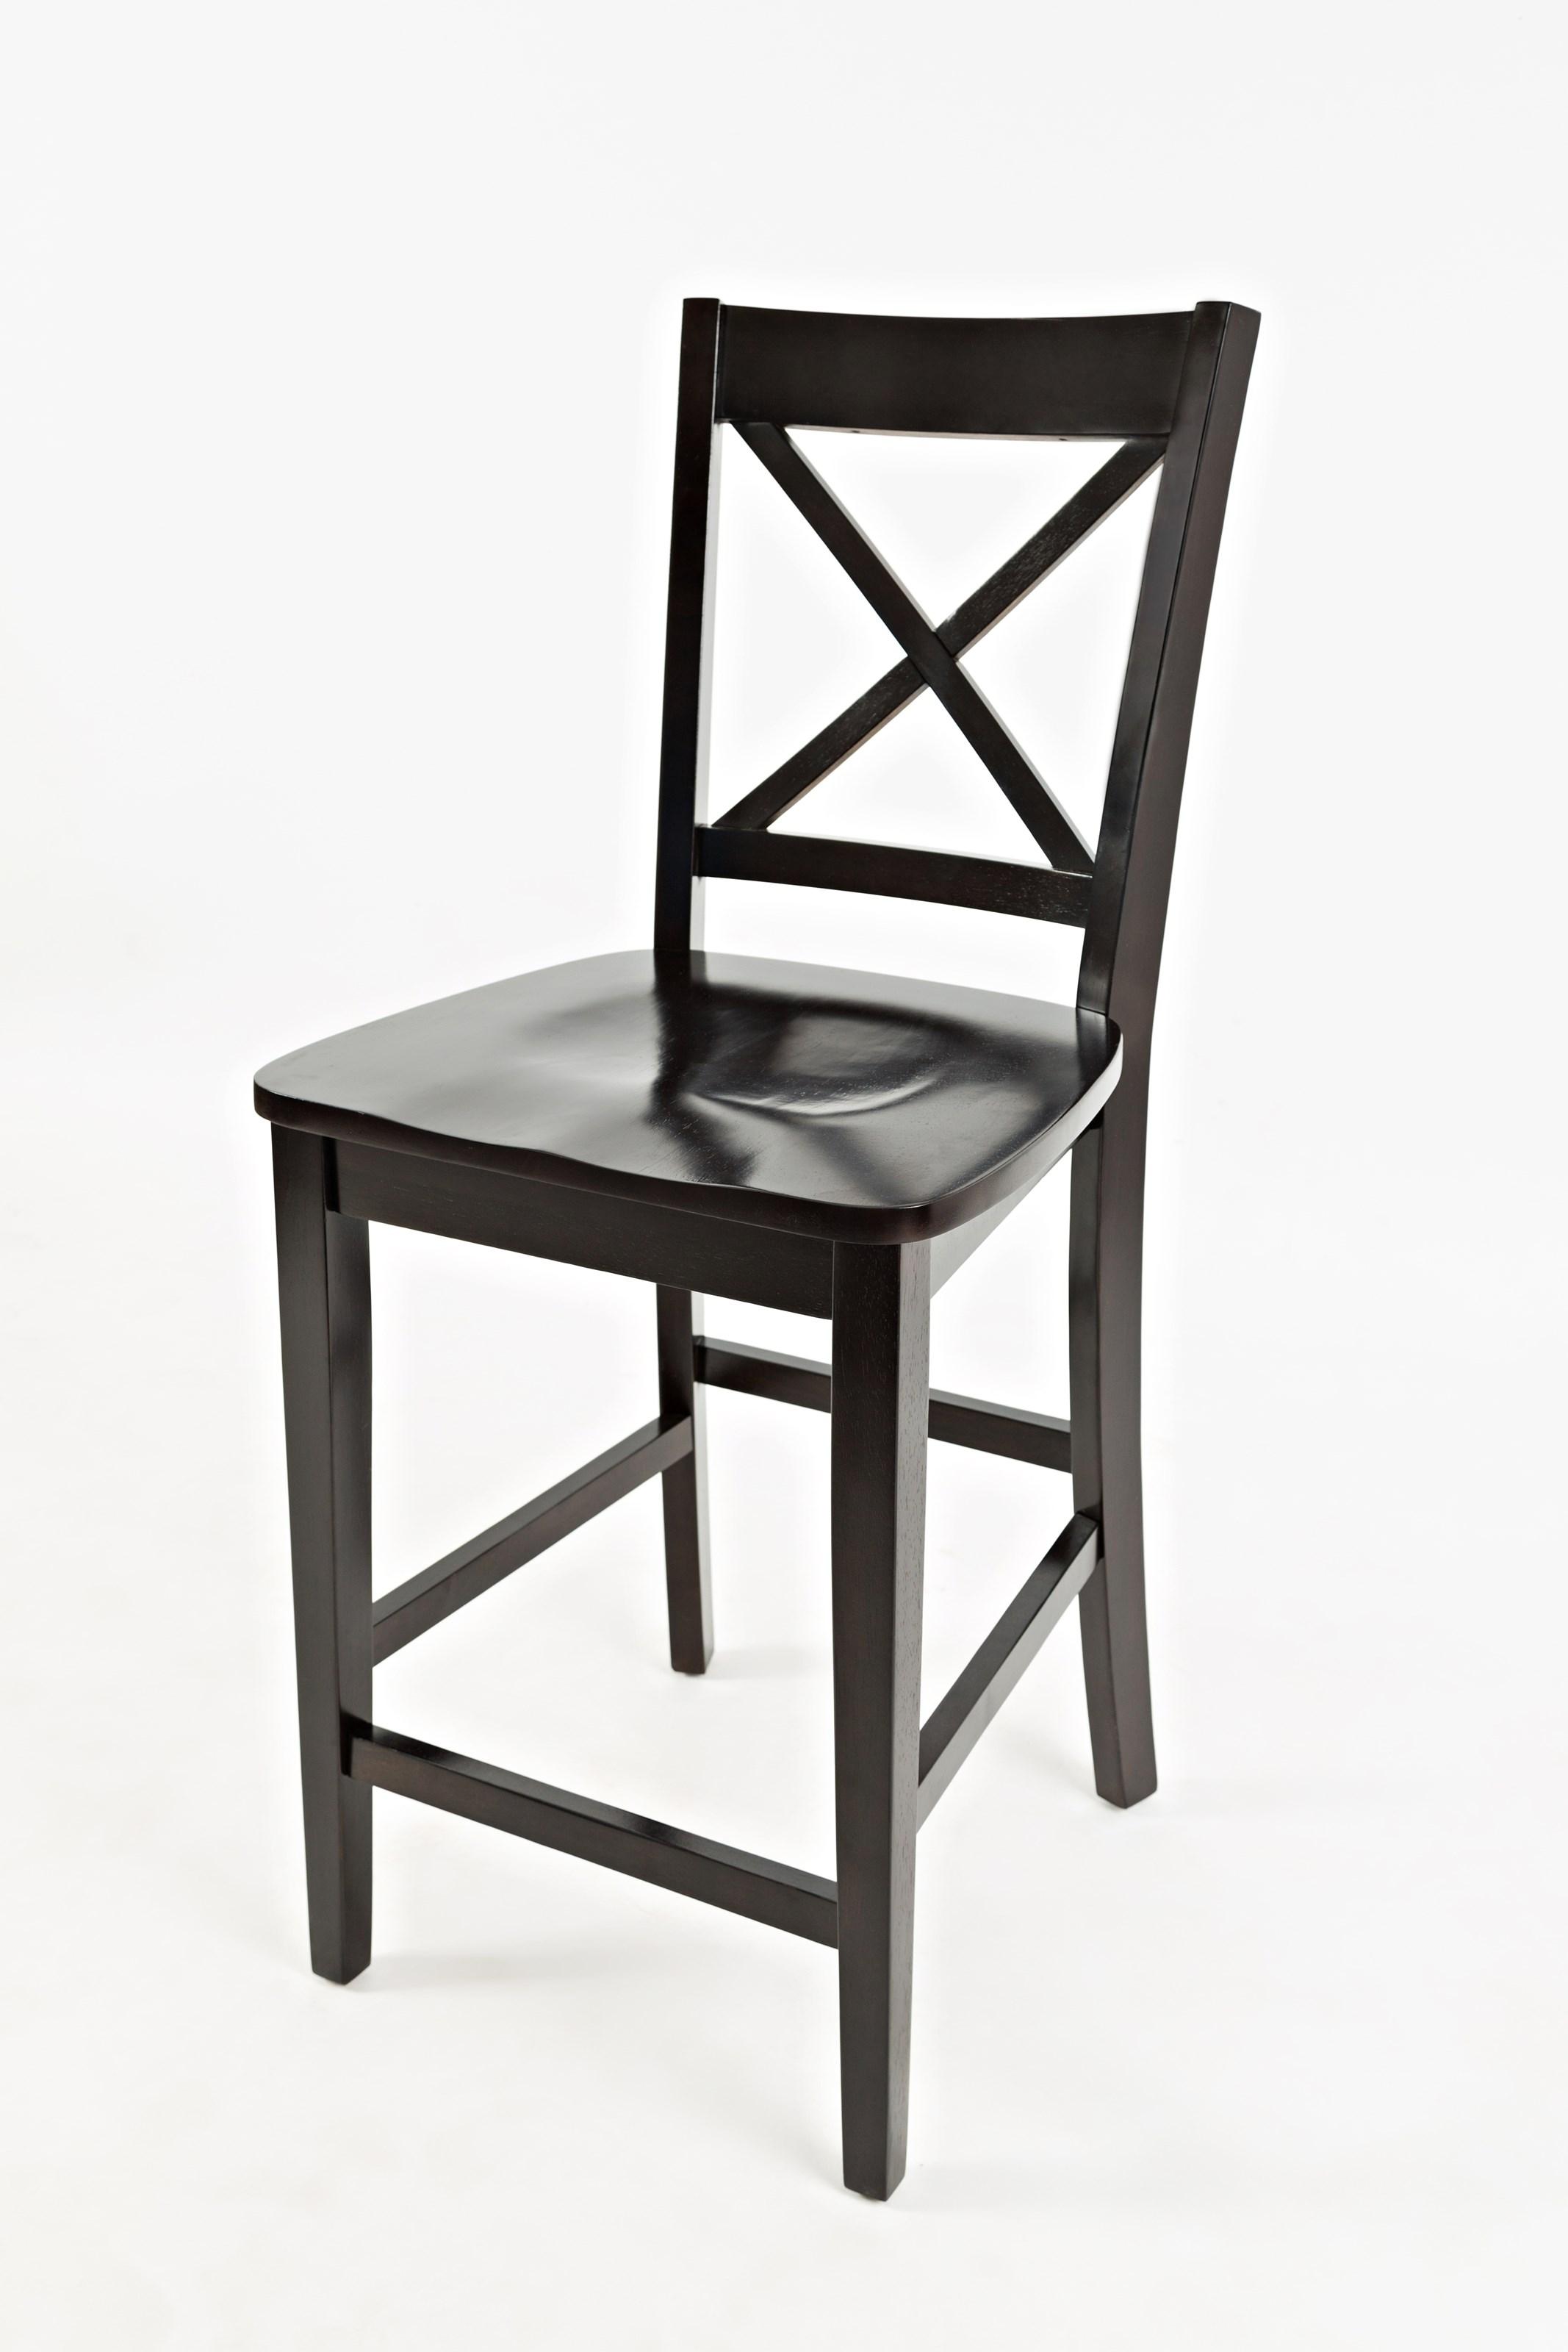 Simplicity X-Back Stool - Counter Height by Jofran at Jofran